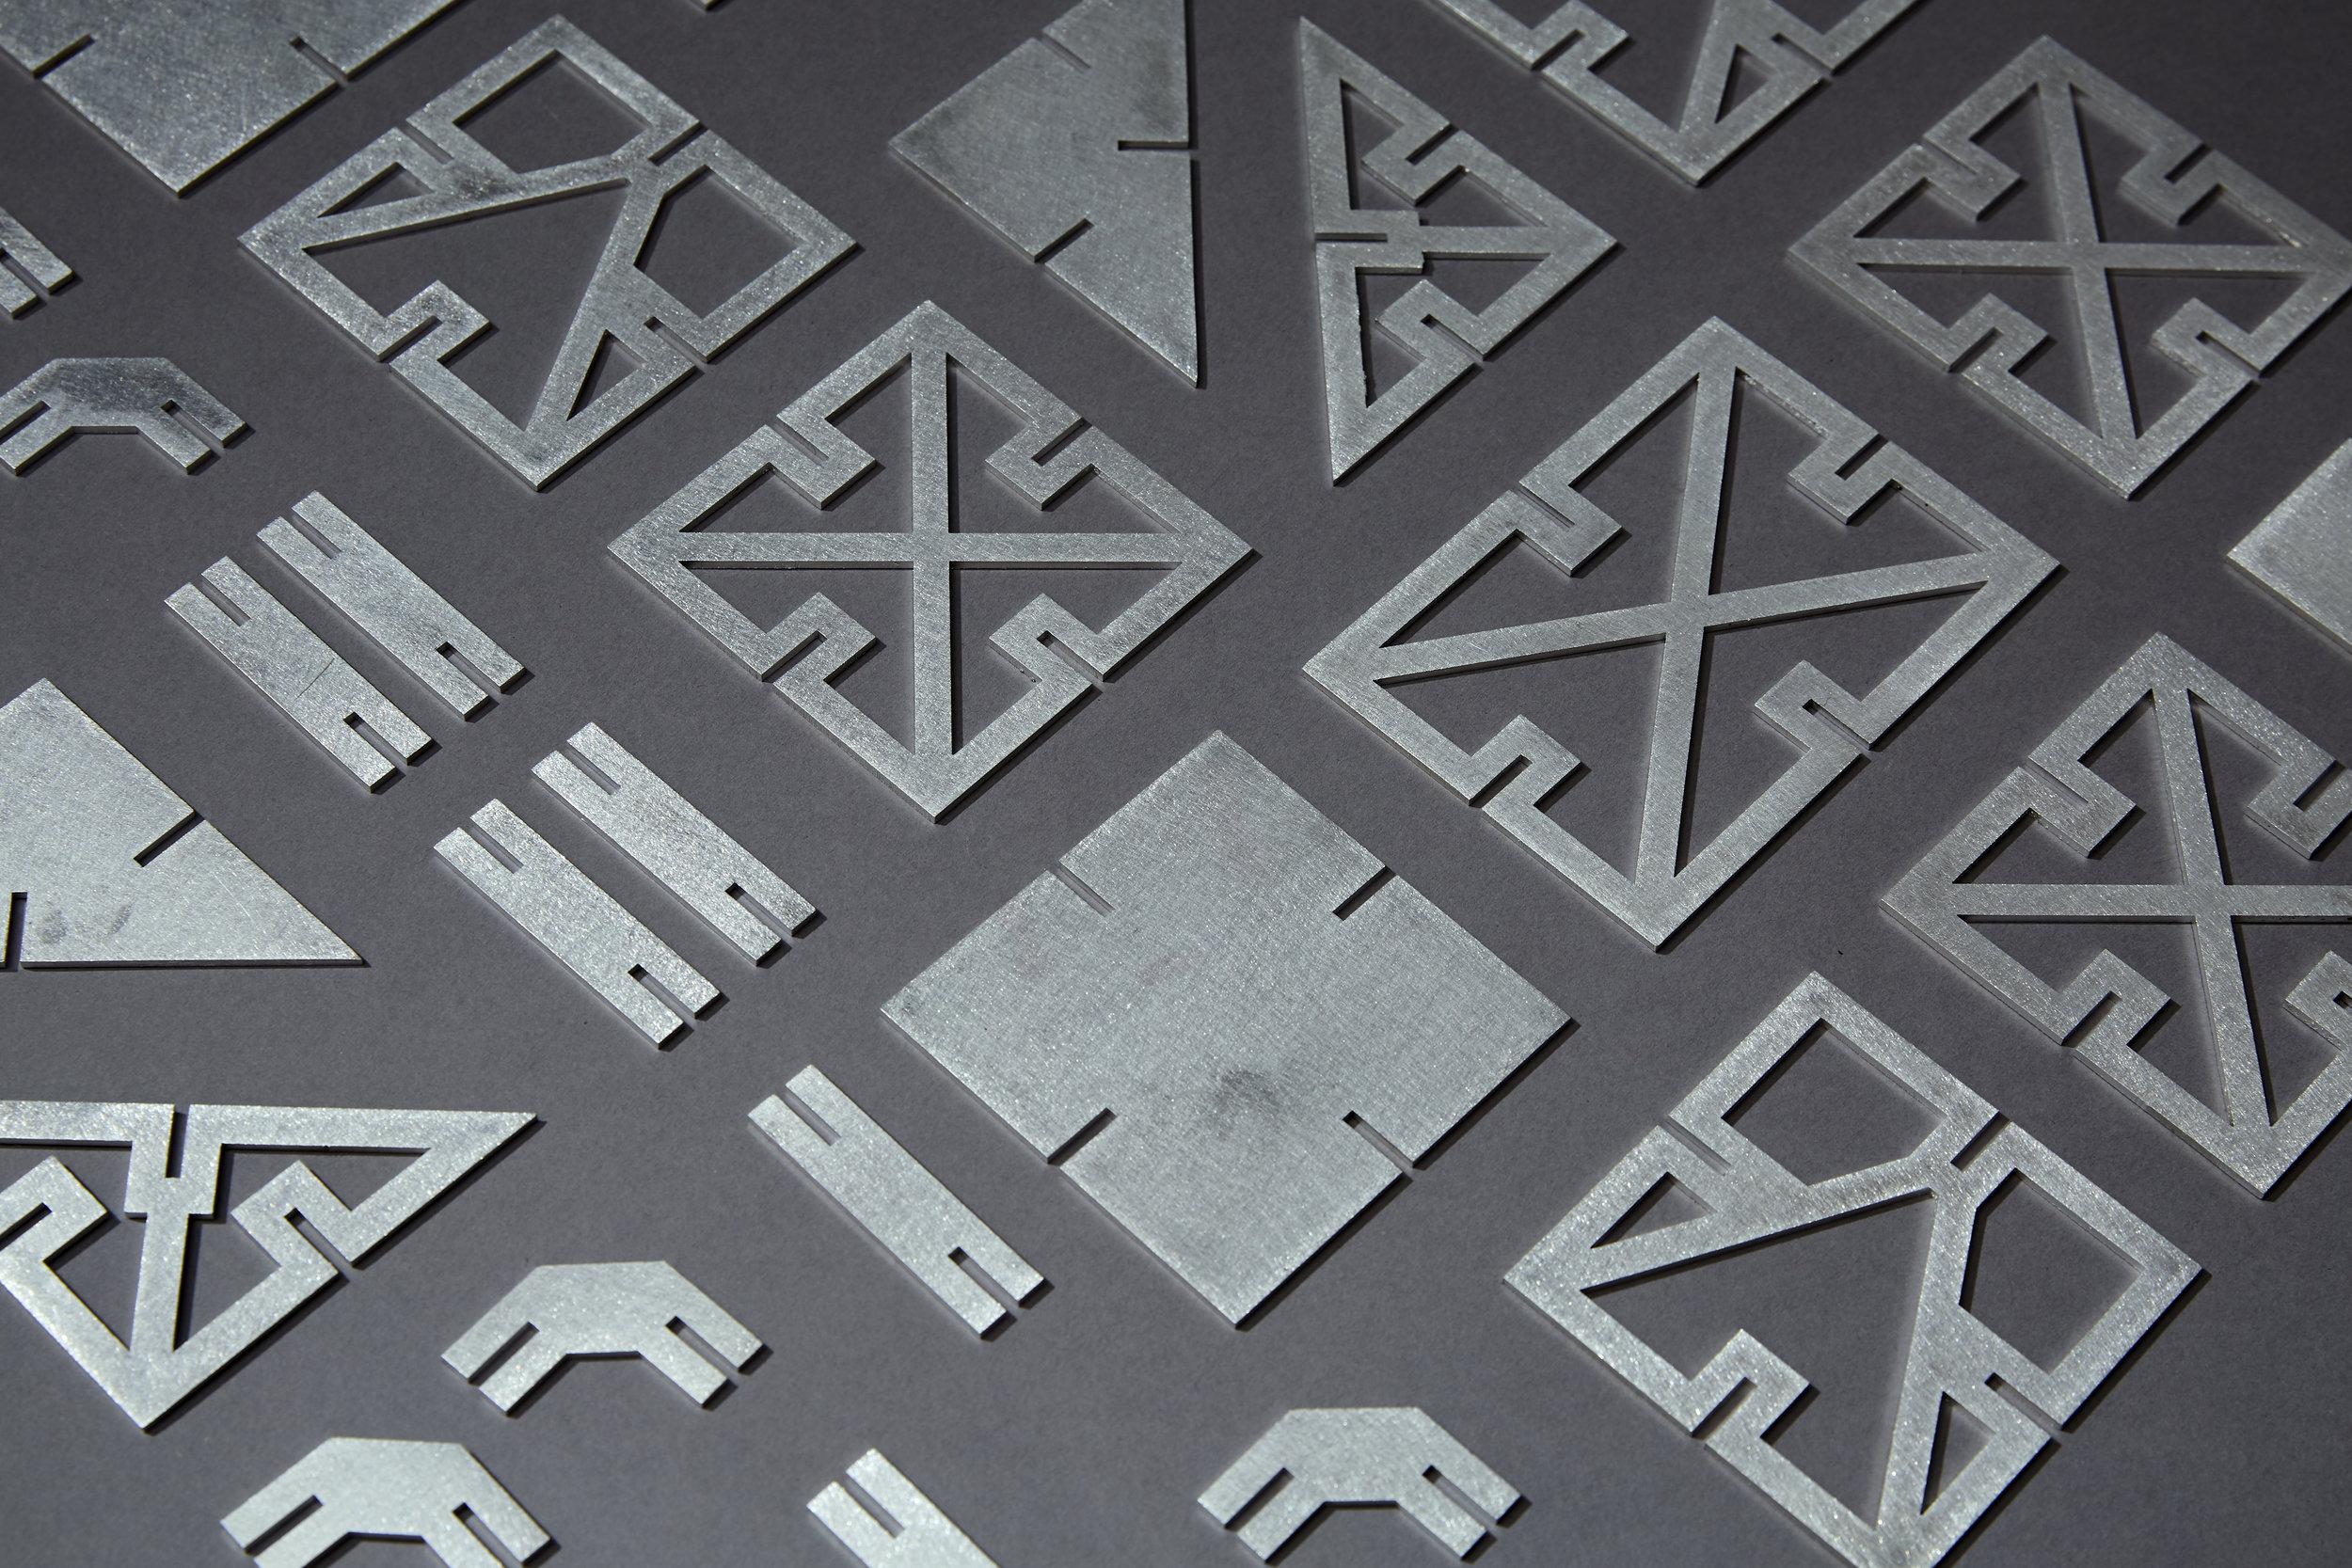 Frameworks Puzzle